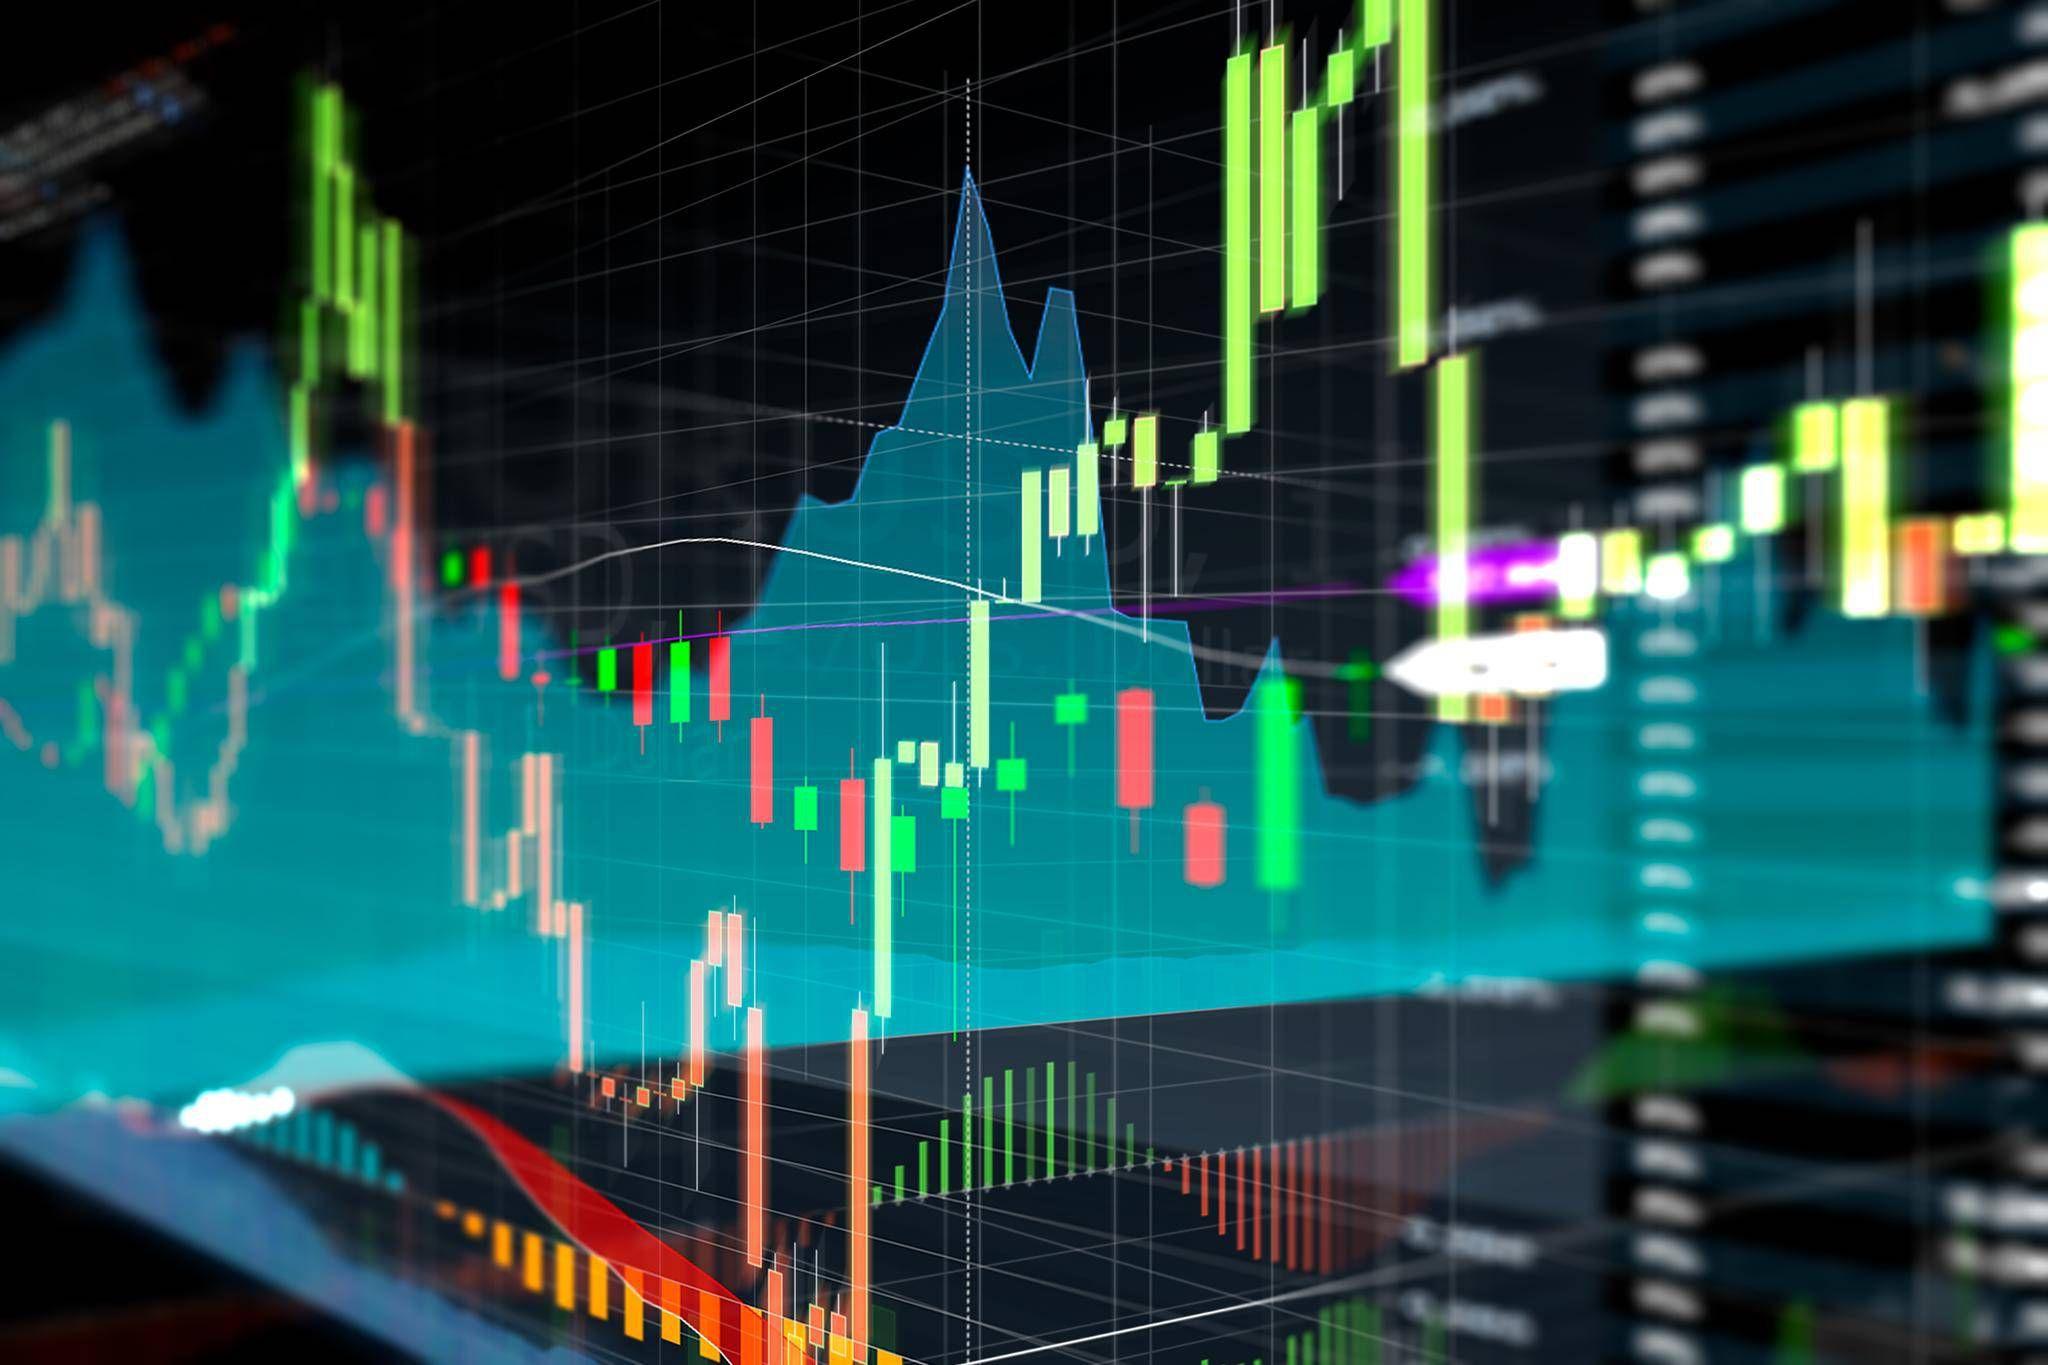 Canaccord Genuity's top 24 stock picks for 2018 - The Globe